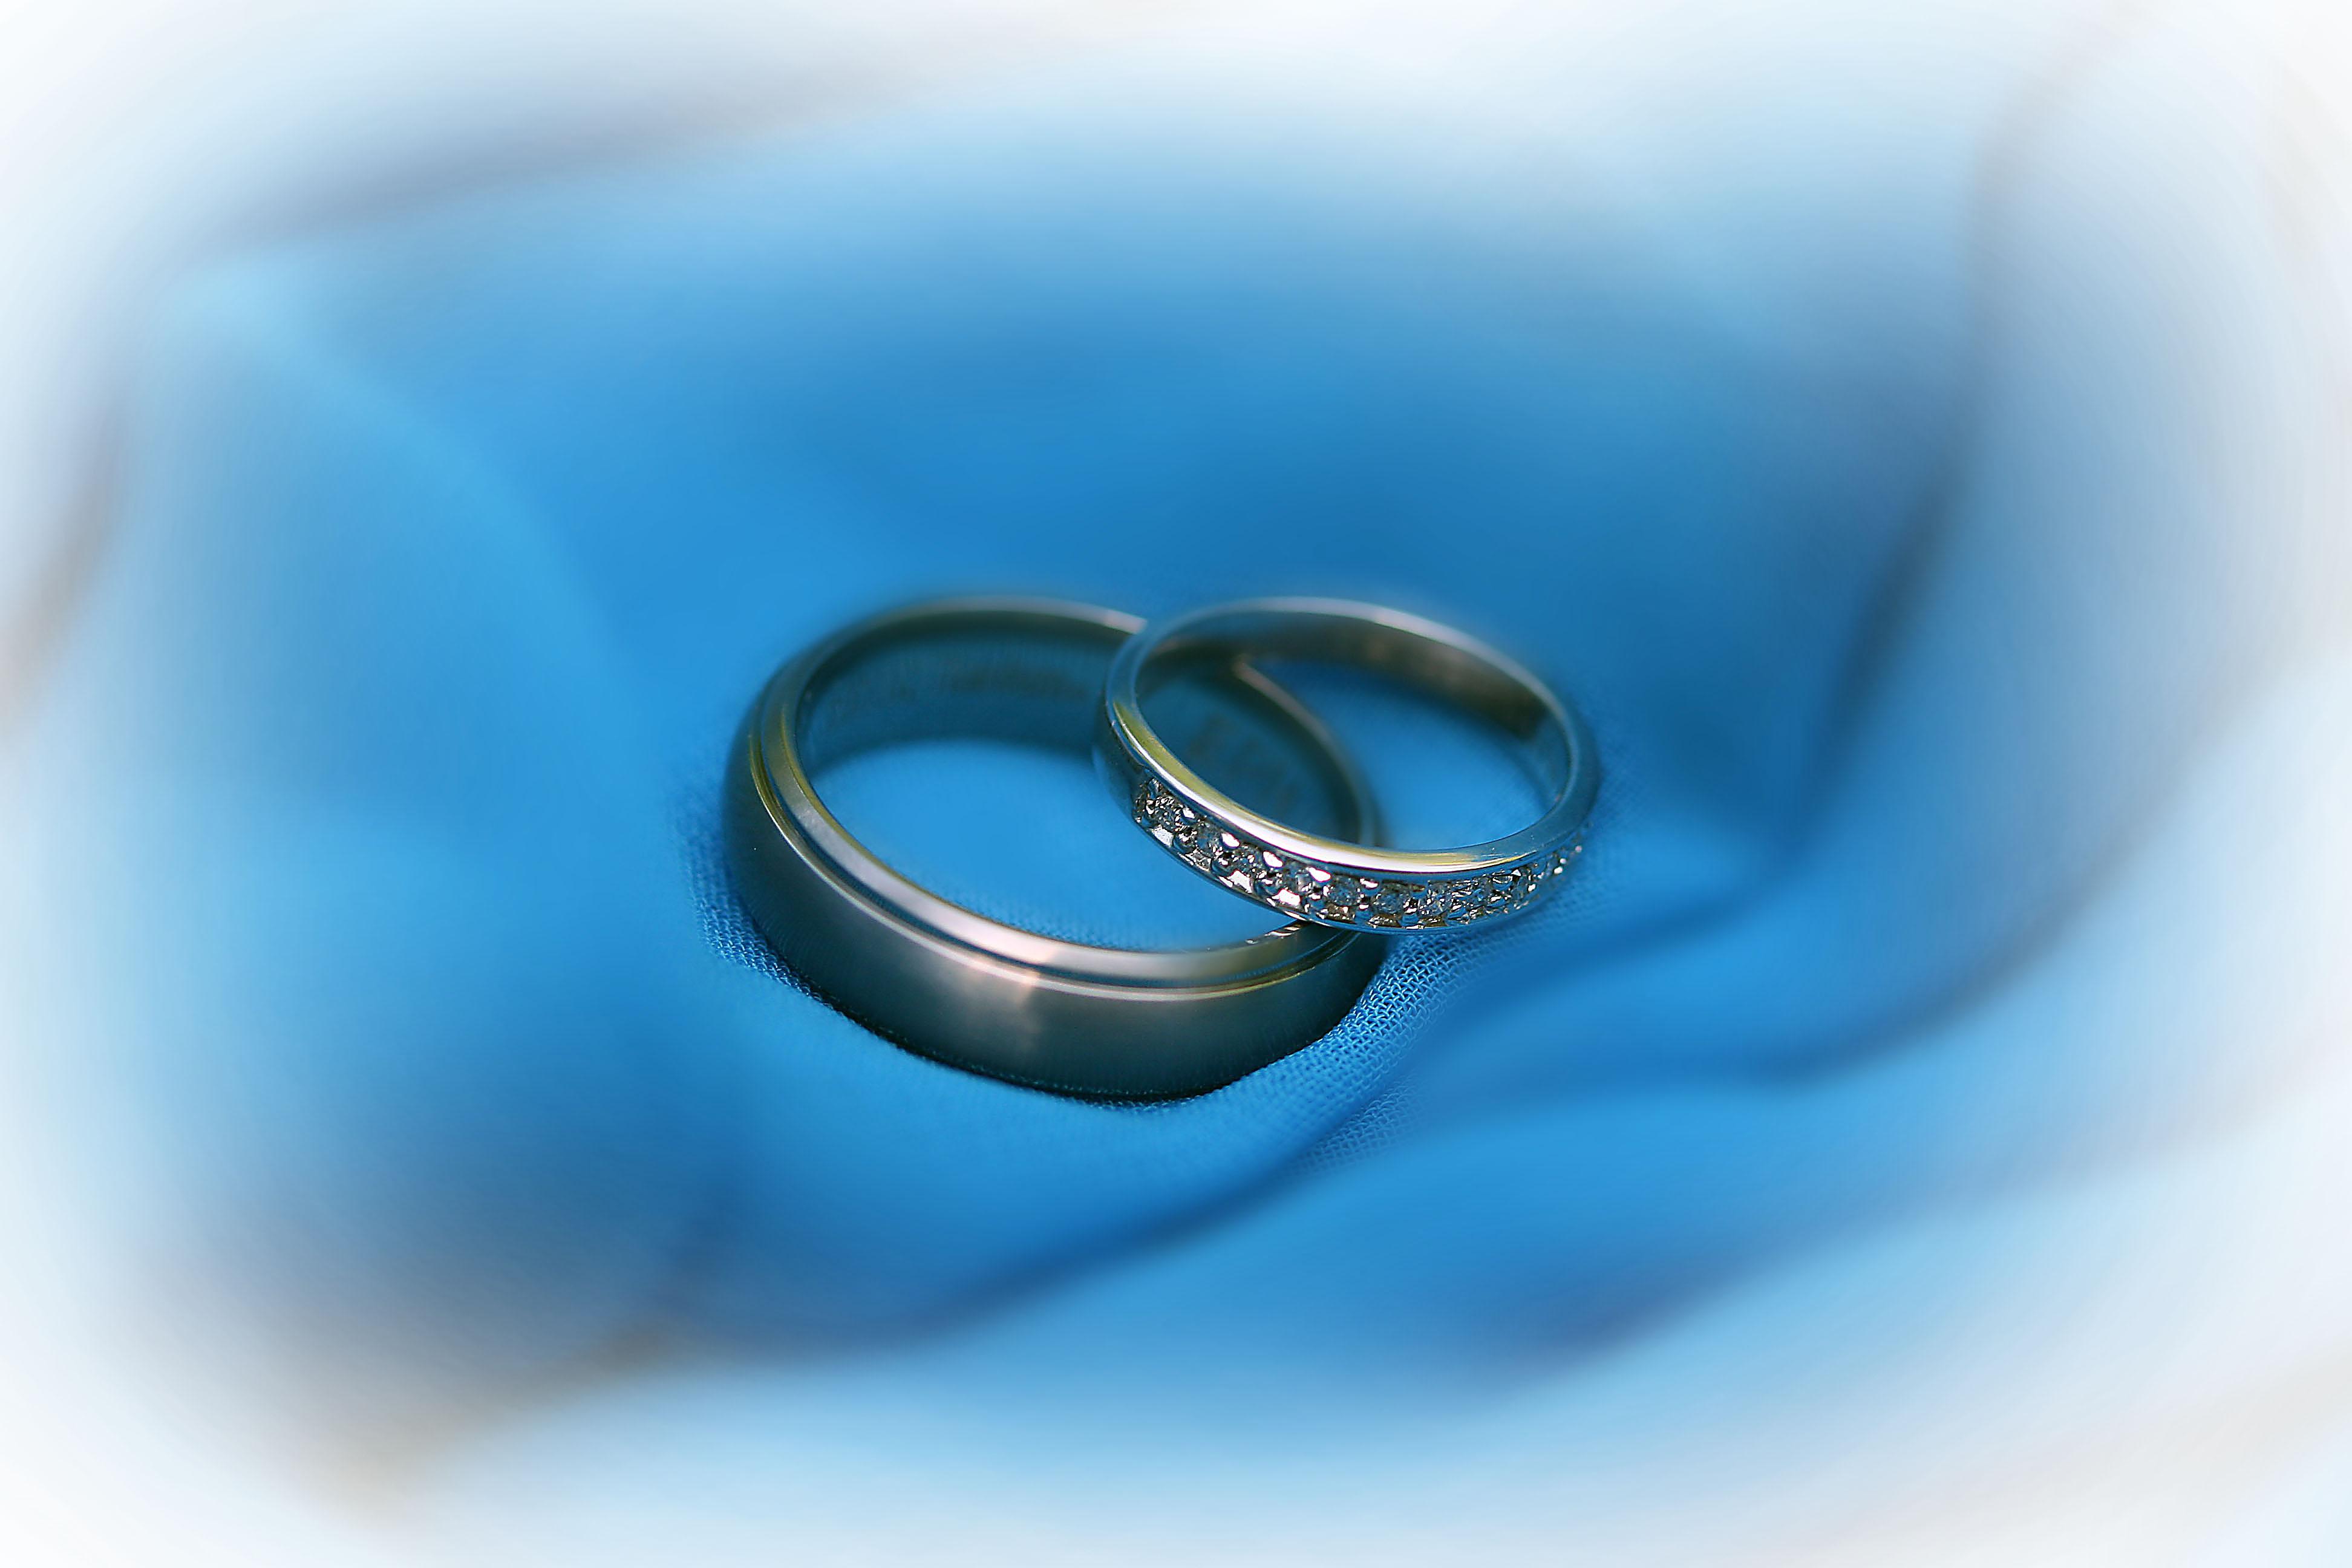 wedding rings blue wedding rings Wedding Rings and Flowers